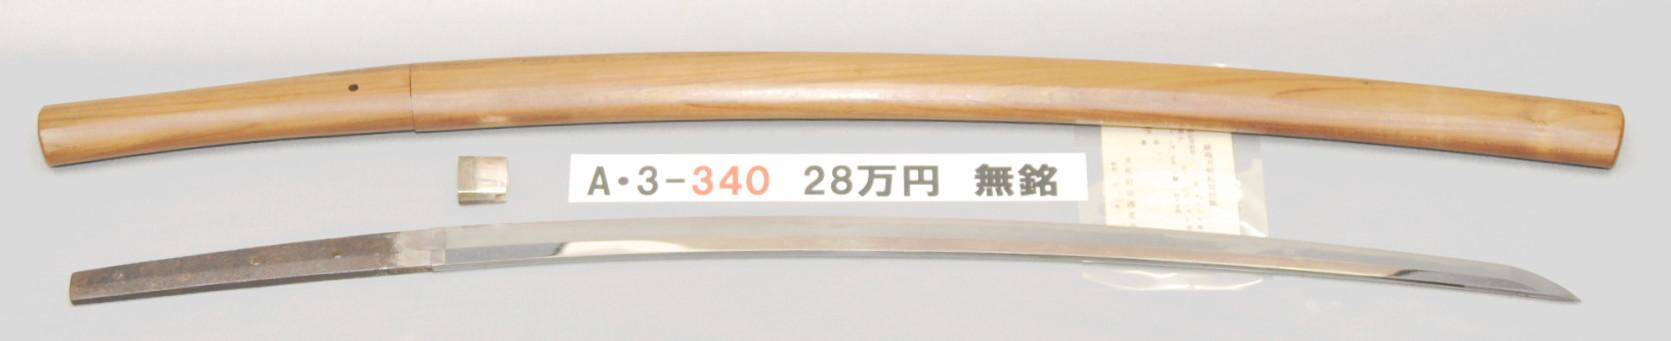 A3340